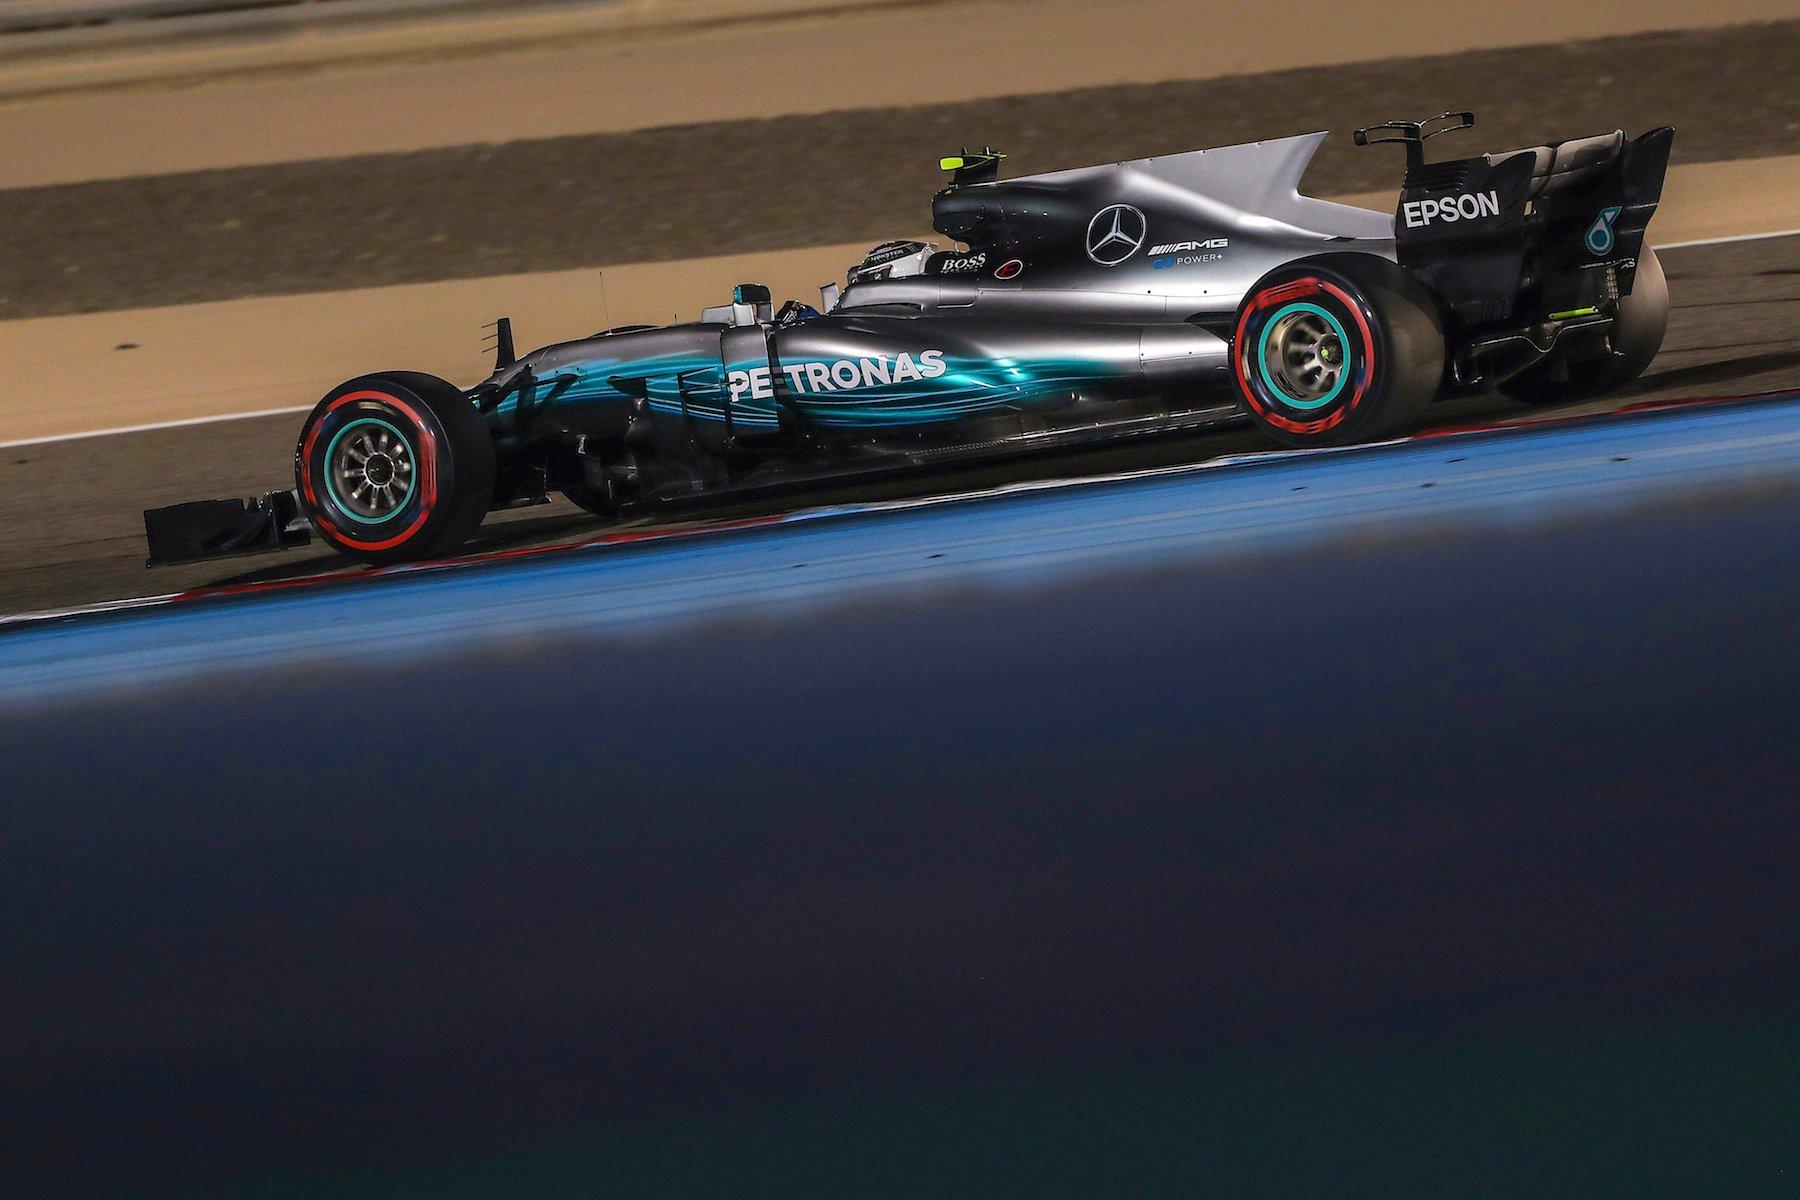 2017 Valtteri Bottas   Mercedes W08   2017 Bahrain GP Pole 3 copy.jpg